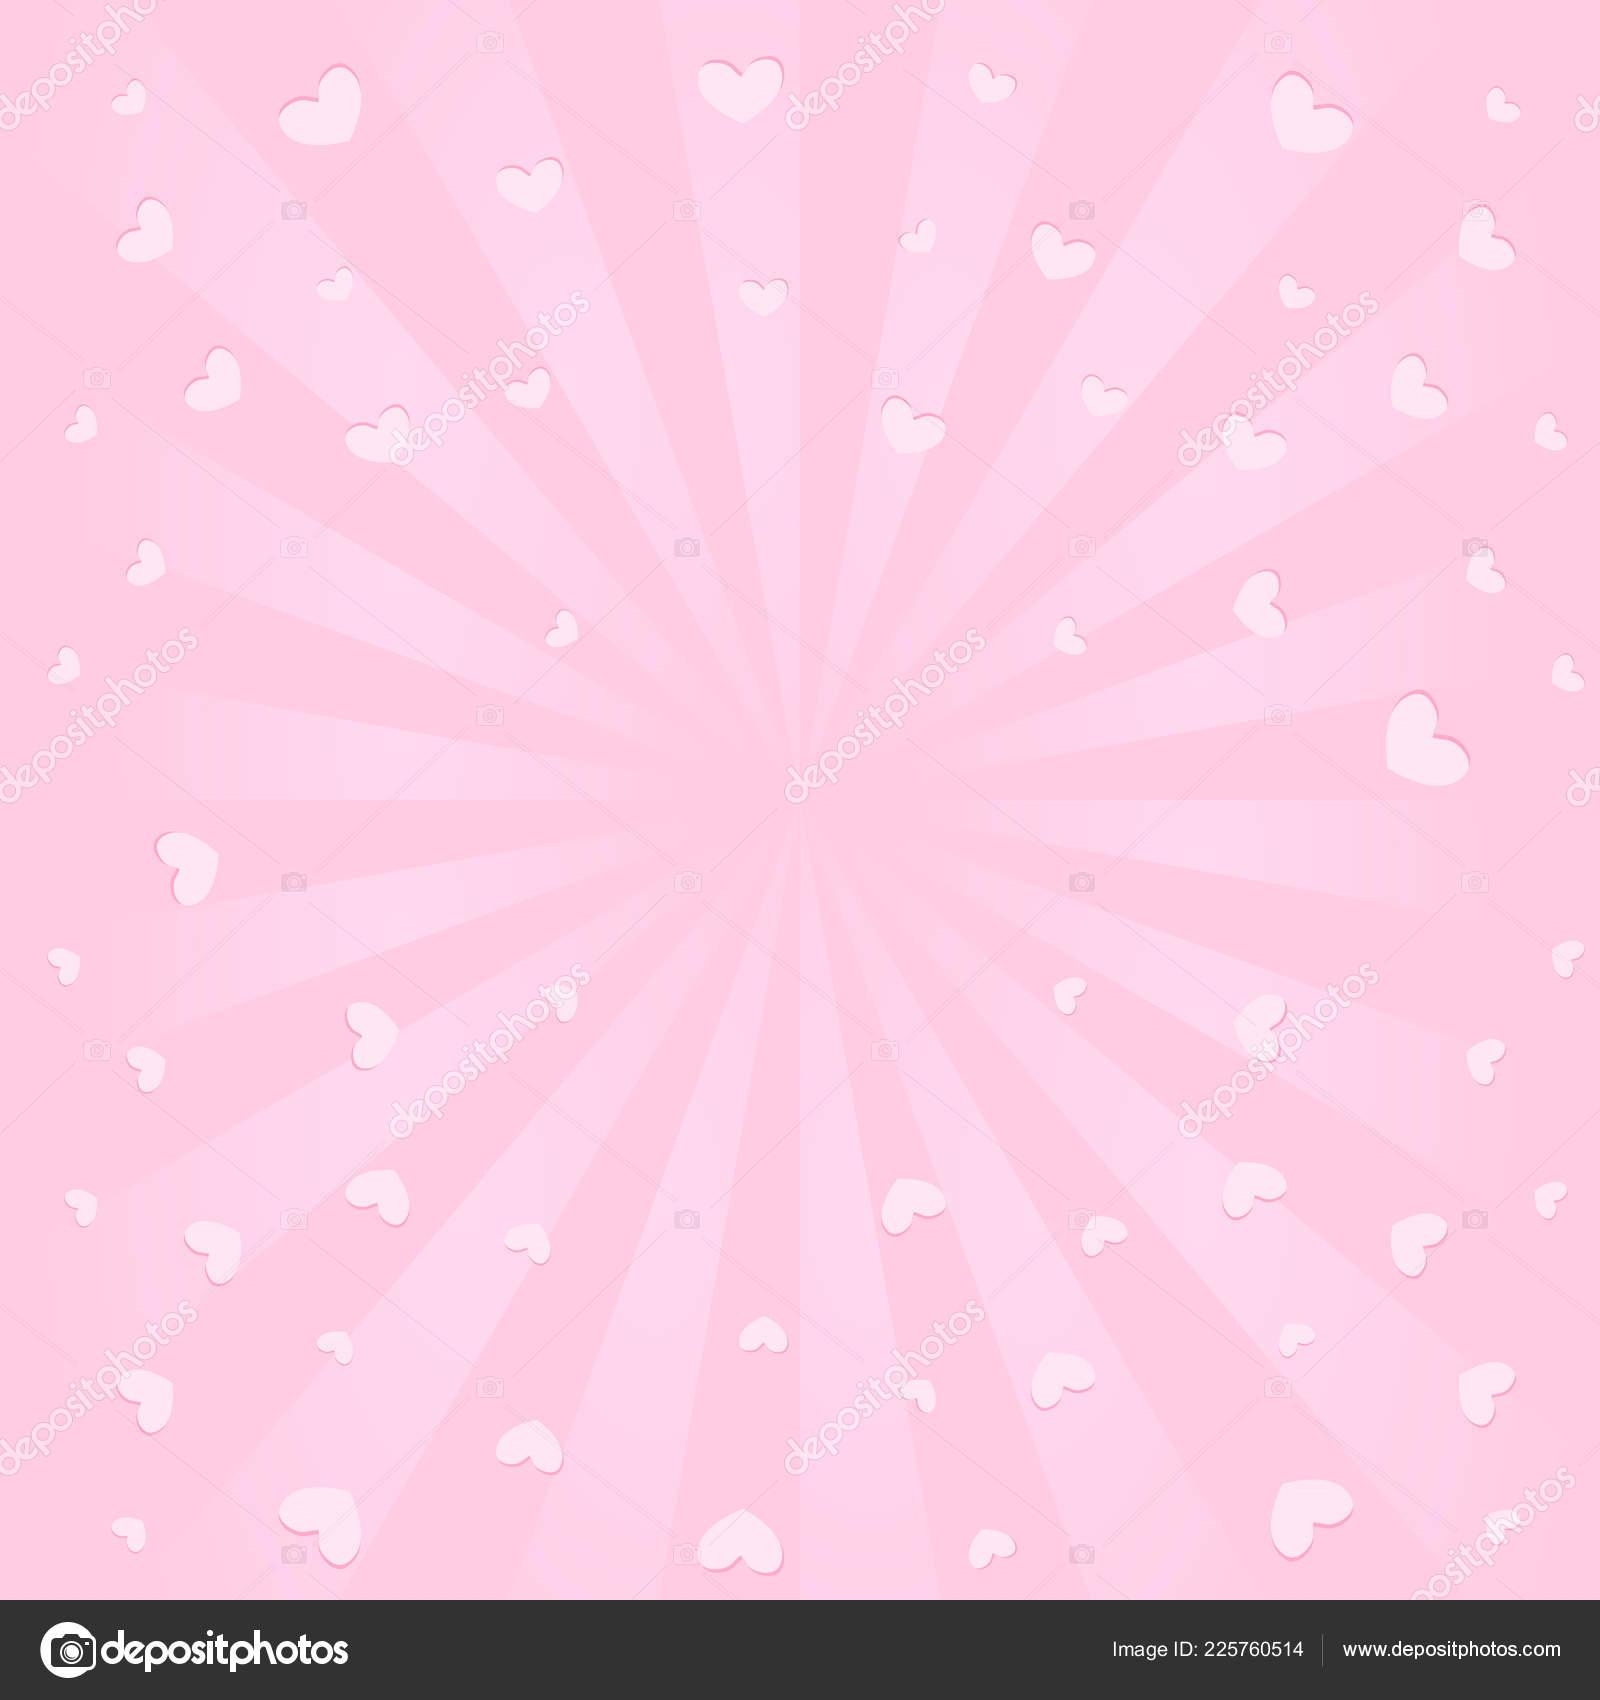 Cute Pink Background Sunbeams Flying Hearts Air Romantic